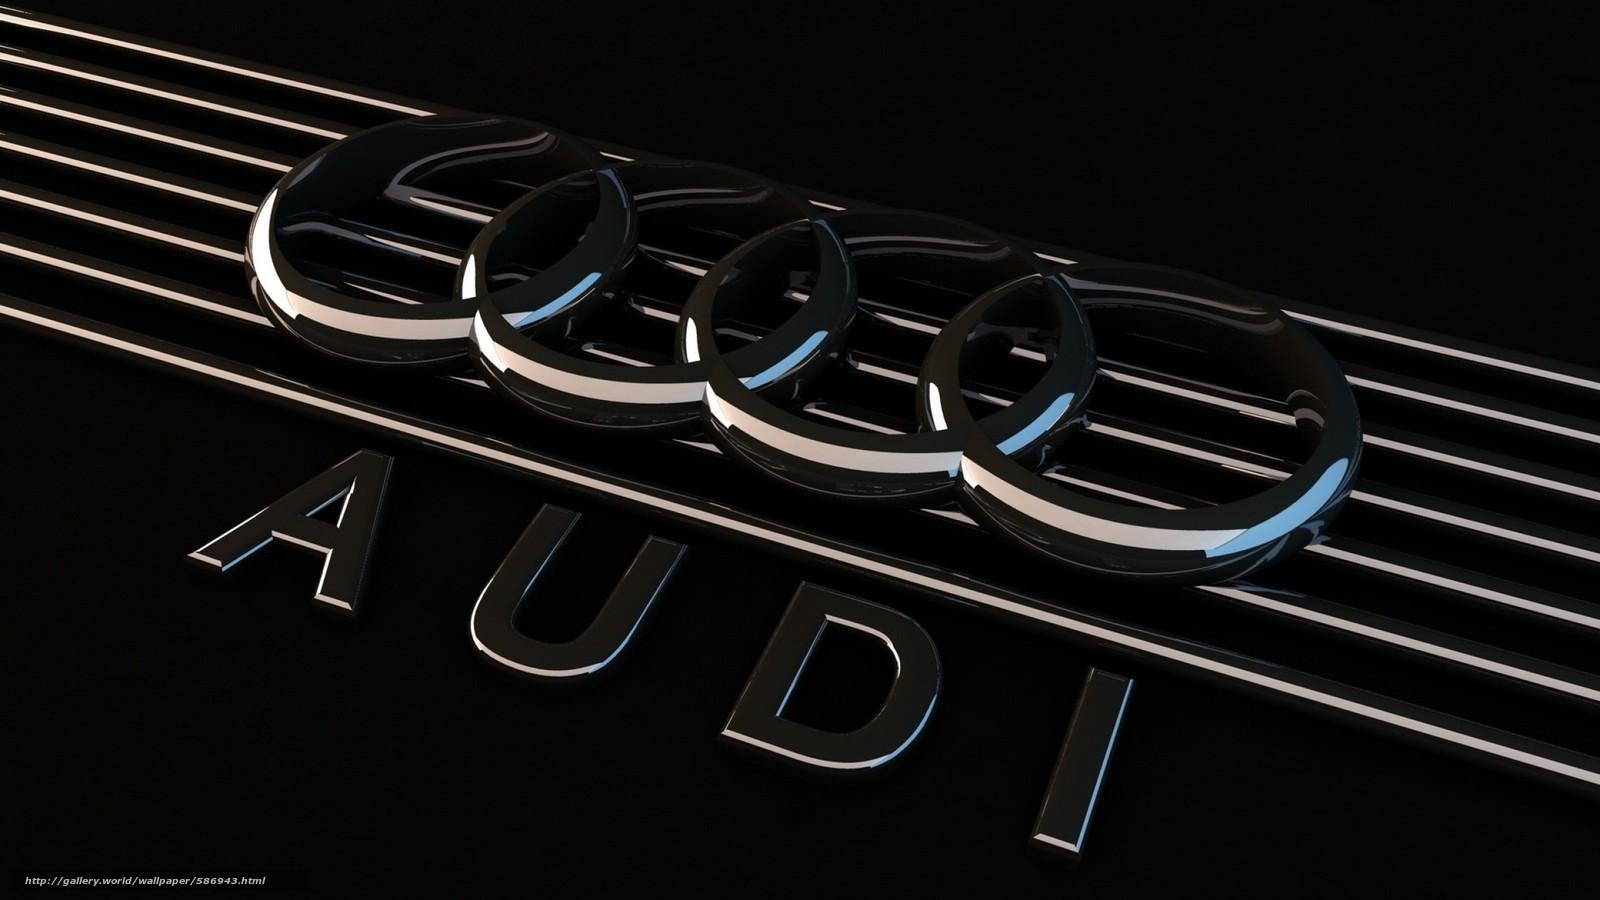 58596889268e3eb04f8b473e moreover Audi Rs Logo in addition 20596 additionally 2400x1350 further Bilder. on audi logo